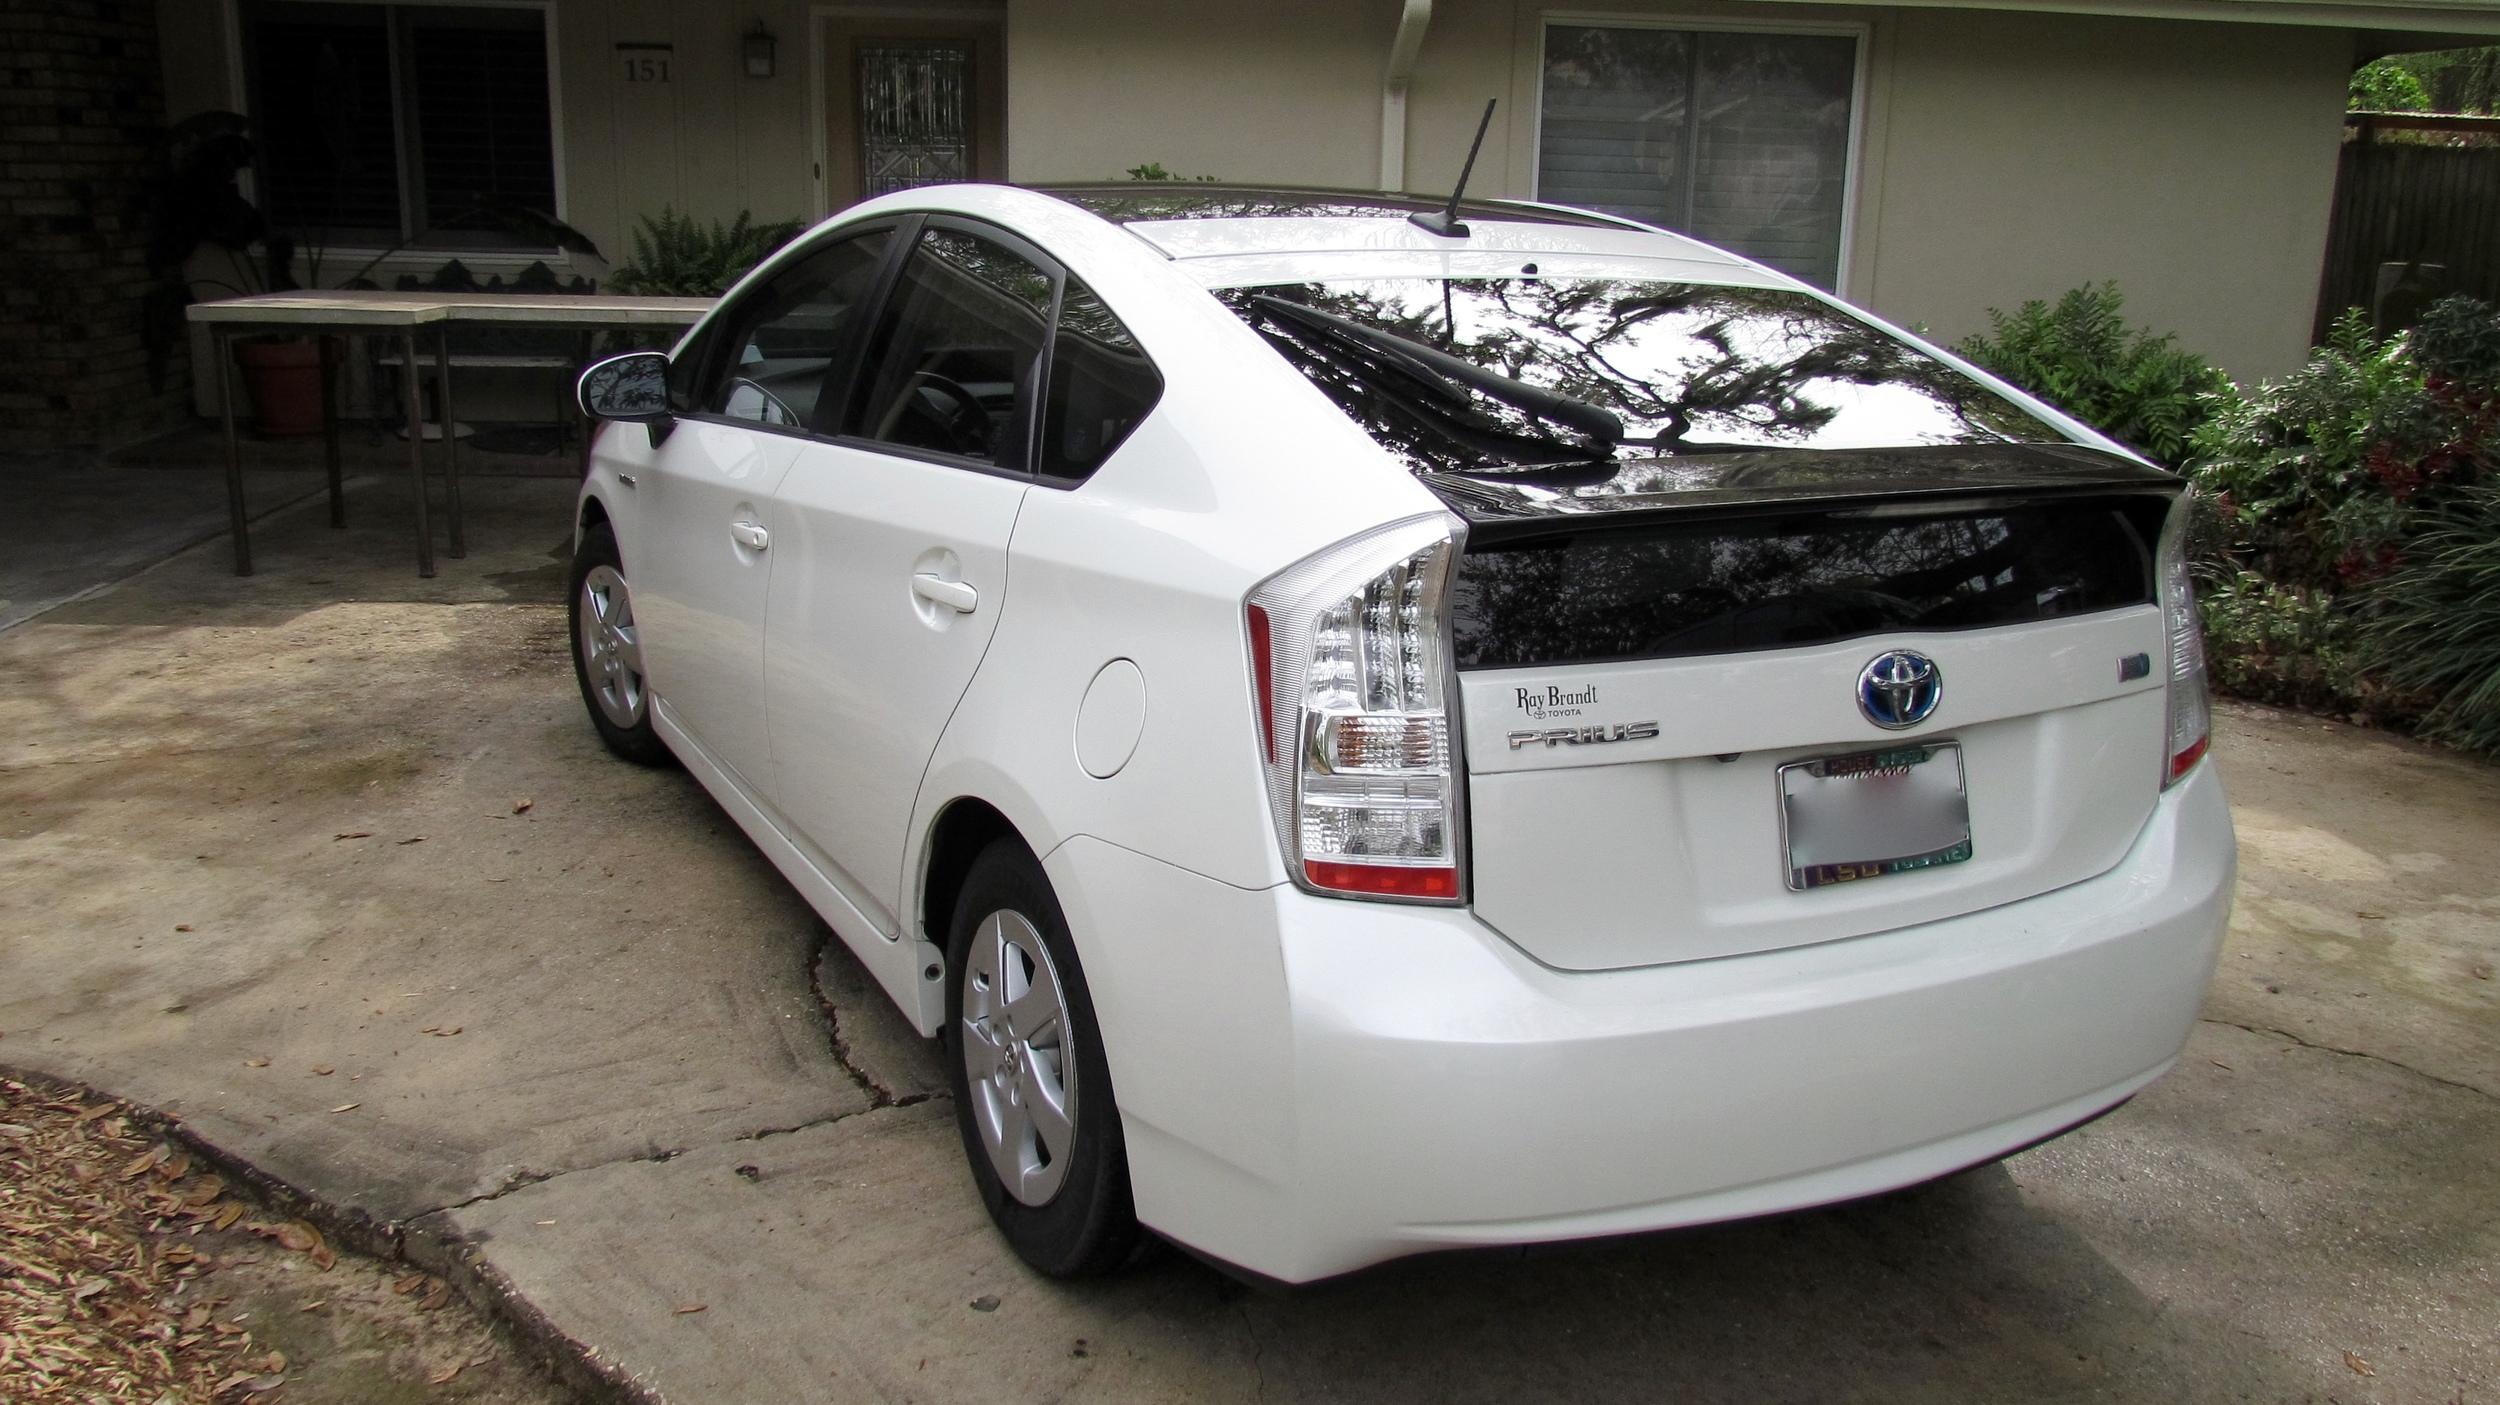 Toyota Prius (Clean Slate)